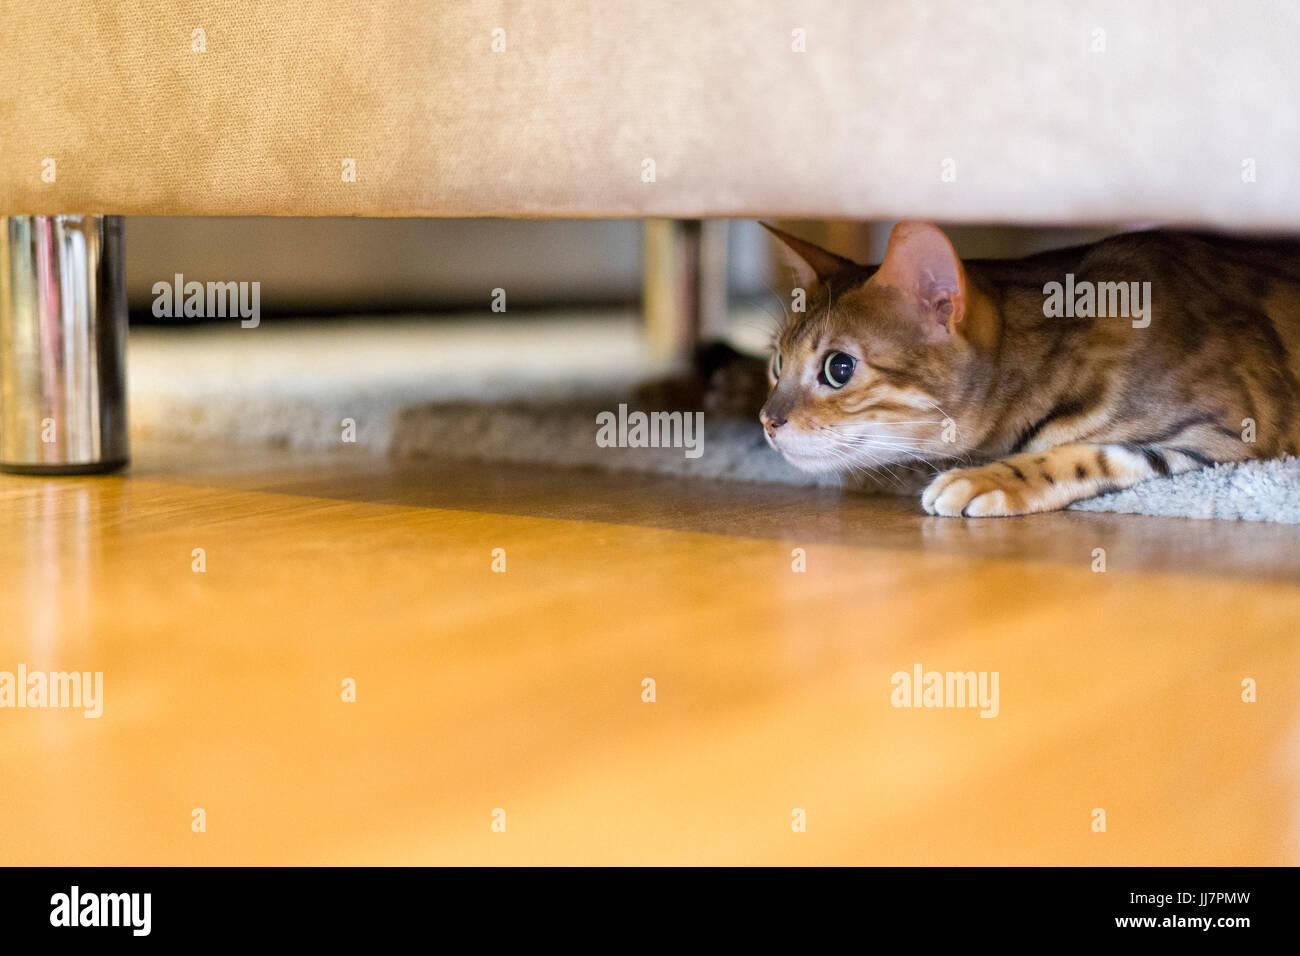 Gato de Bengala femenino moviéndose lentamente y silenciosamente debajo del sofá listos para atacar a modelo de Foto de stock